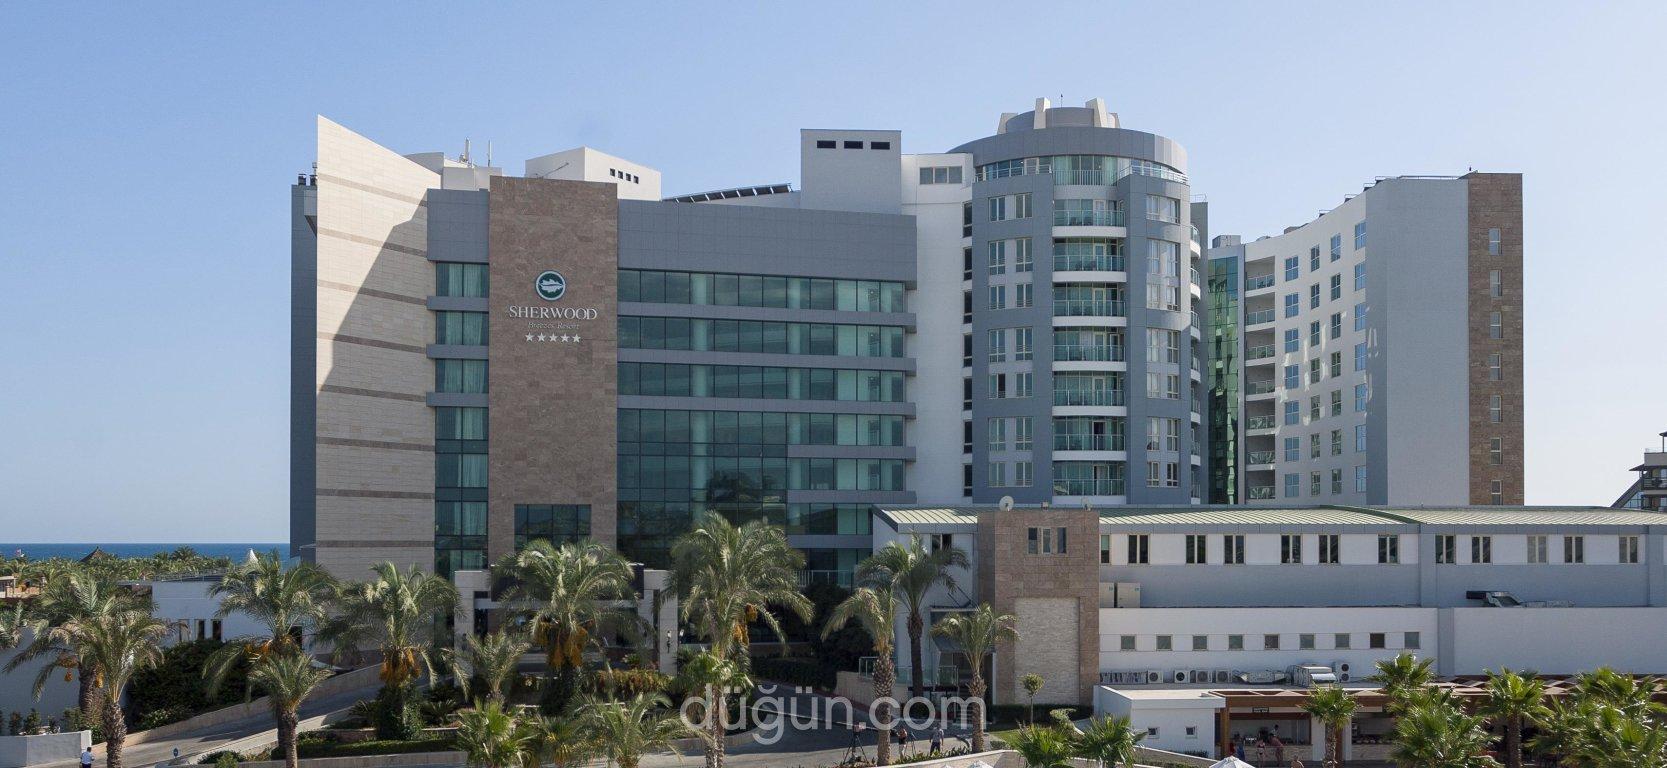 Sherwood Resort & Hotels